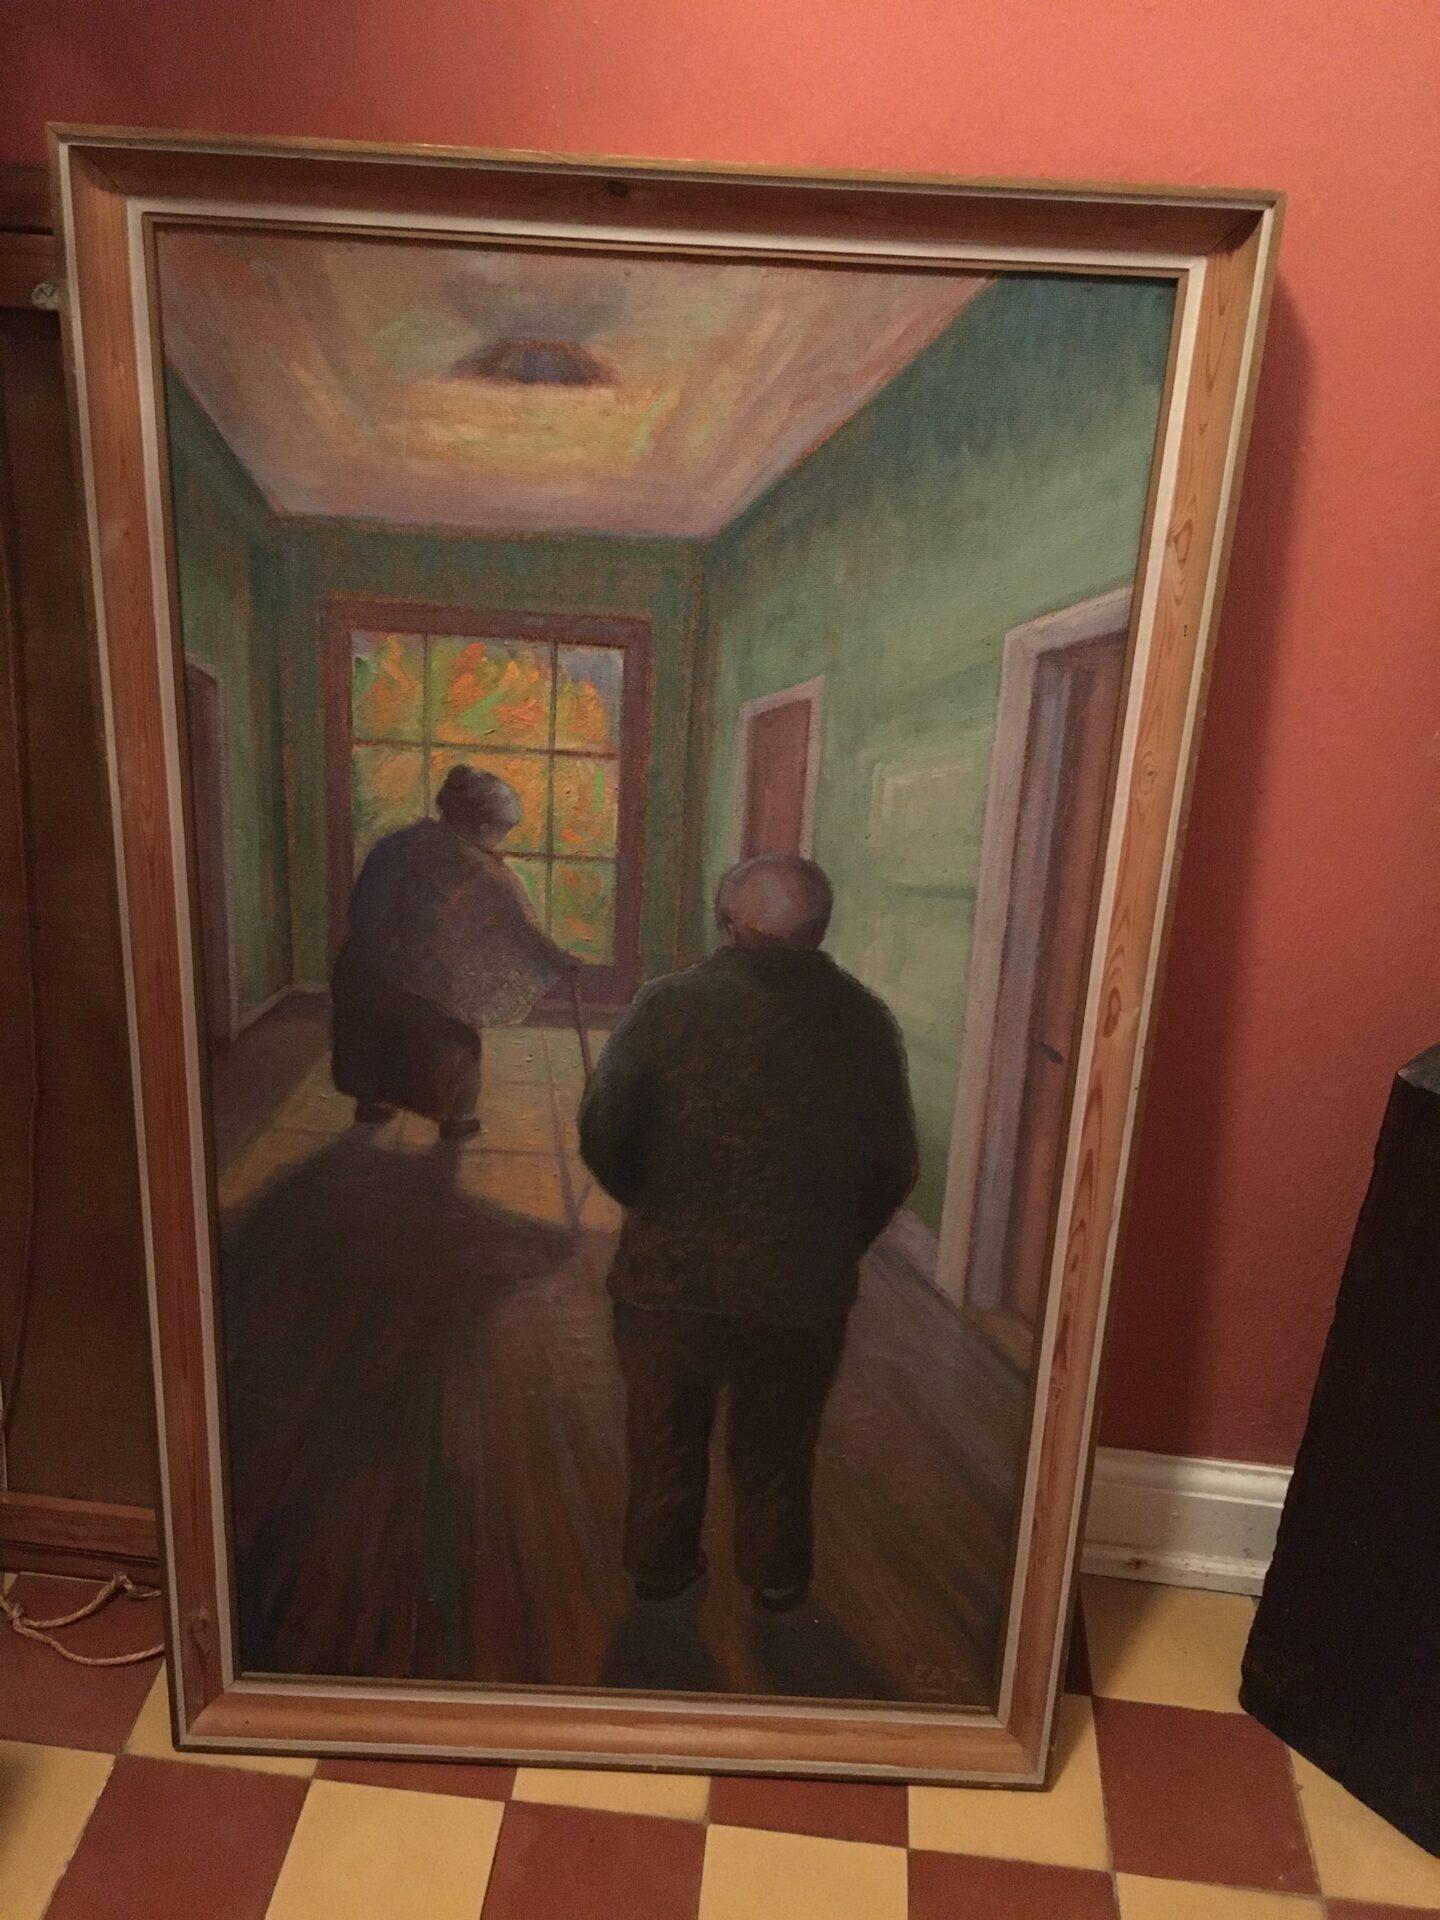 Stort maleri sign EAJ (ukendt), rammemål 68x113cm, pris 300kr